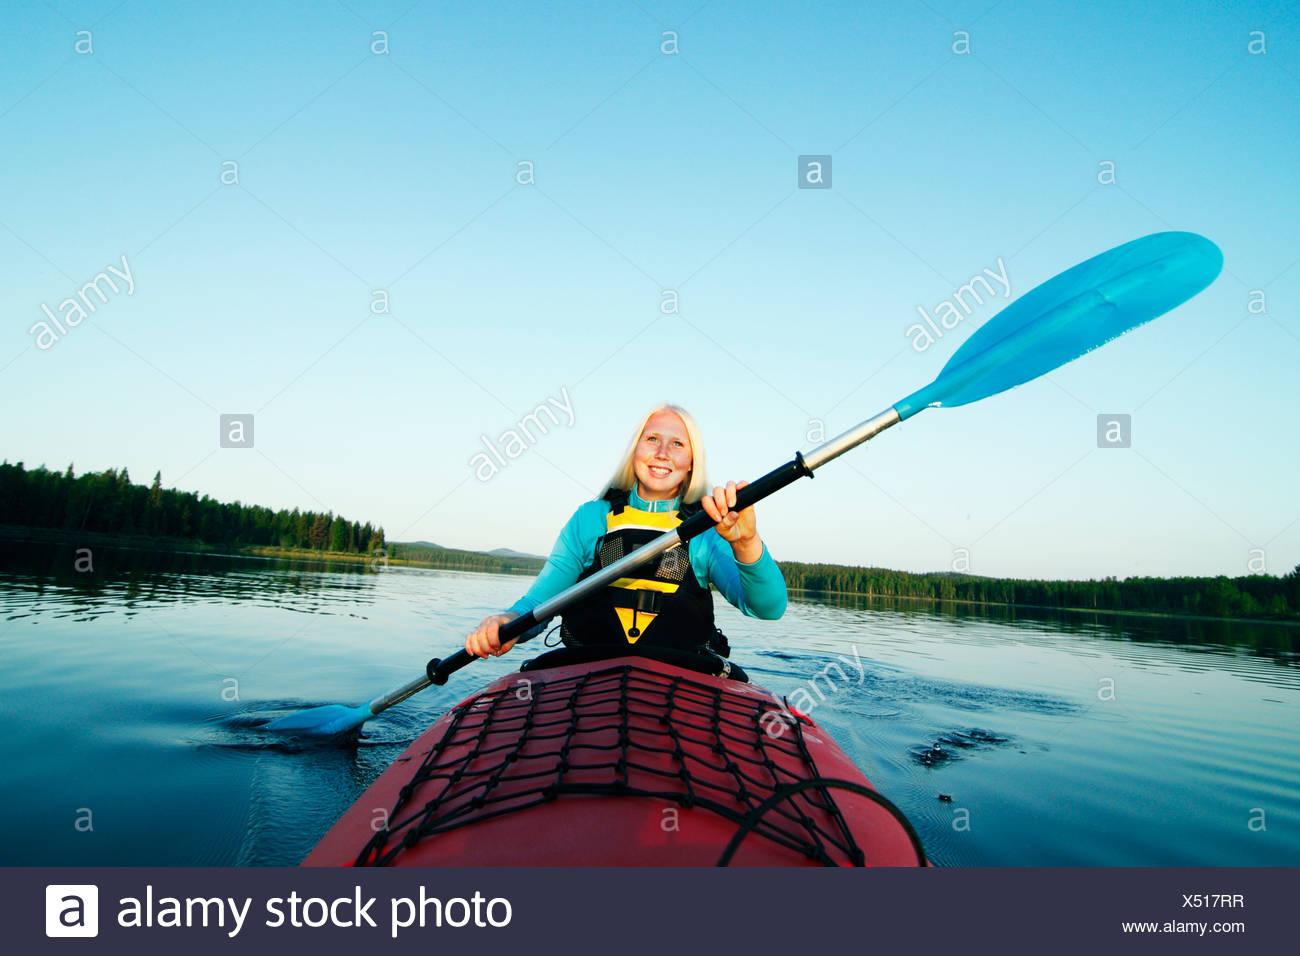 Smiling woman holding paddle - Stock Image